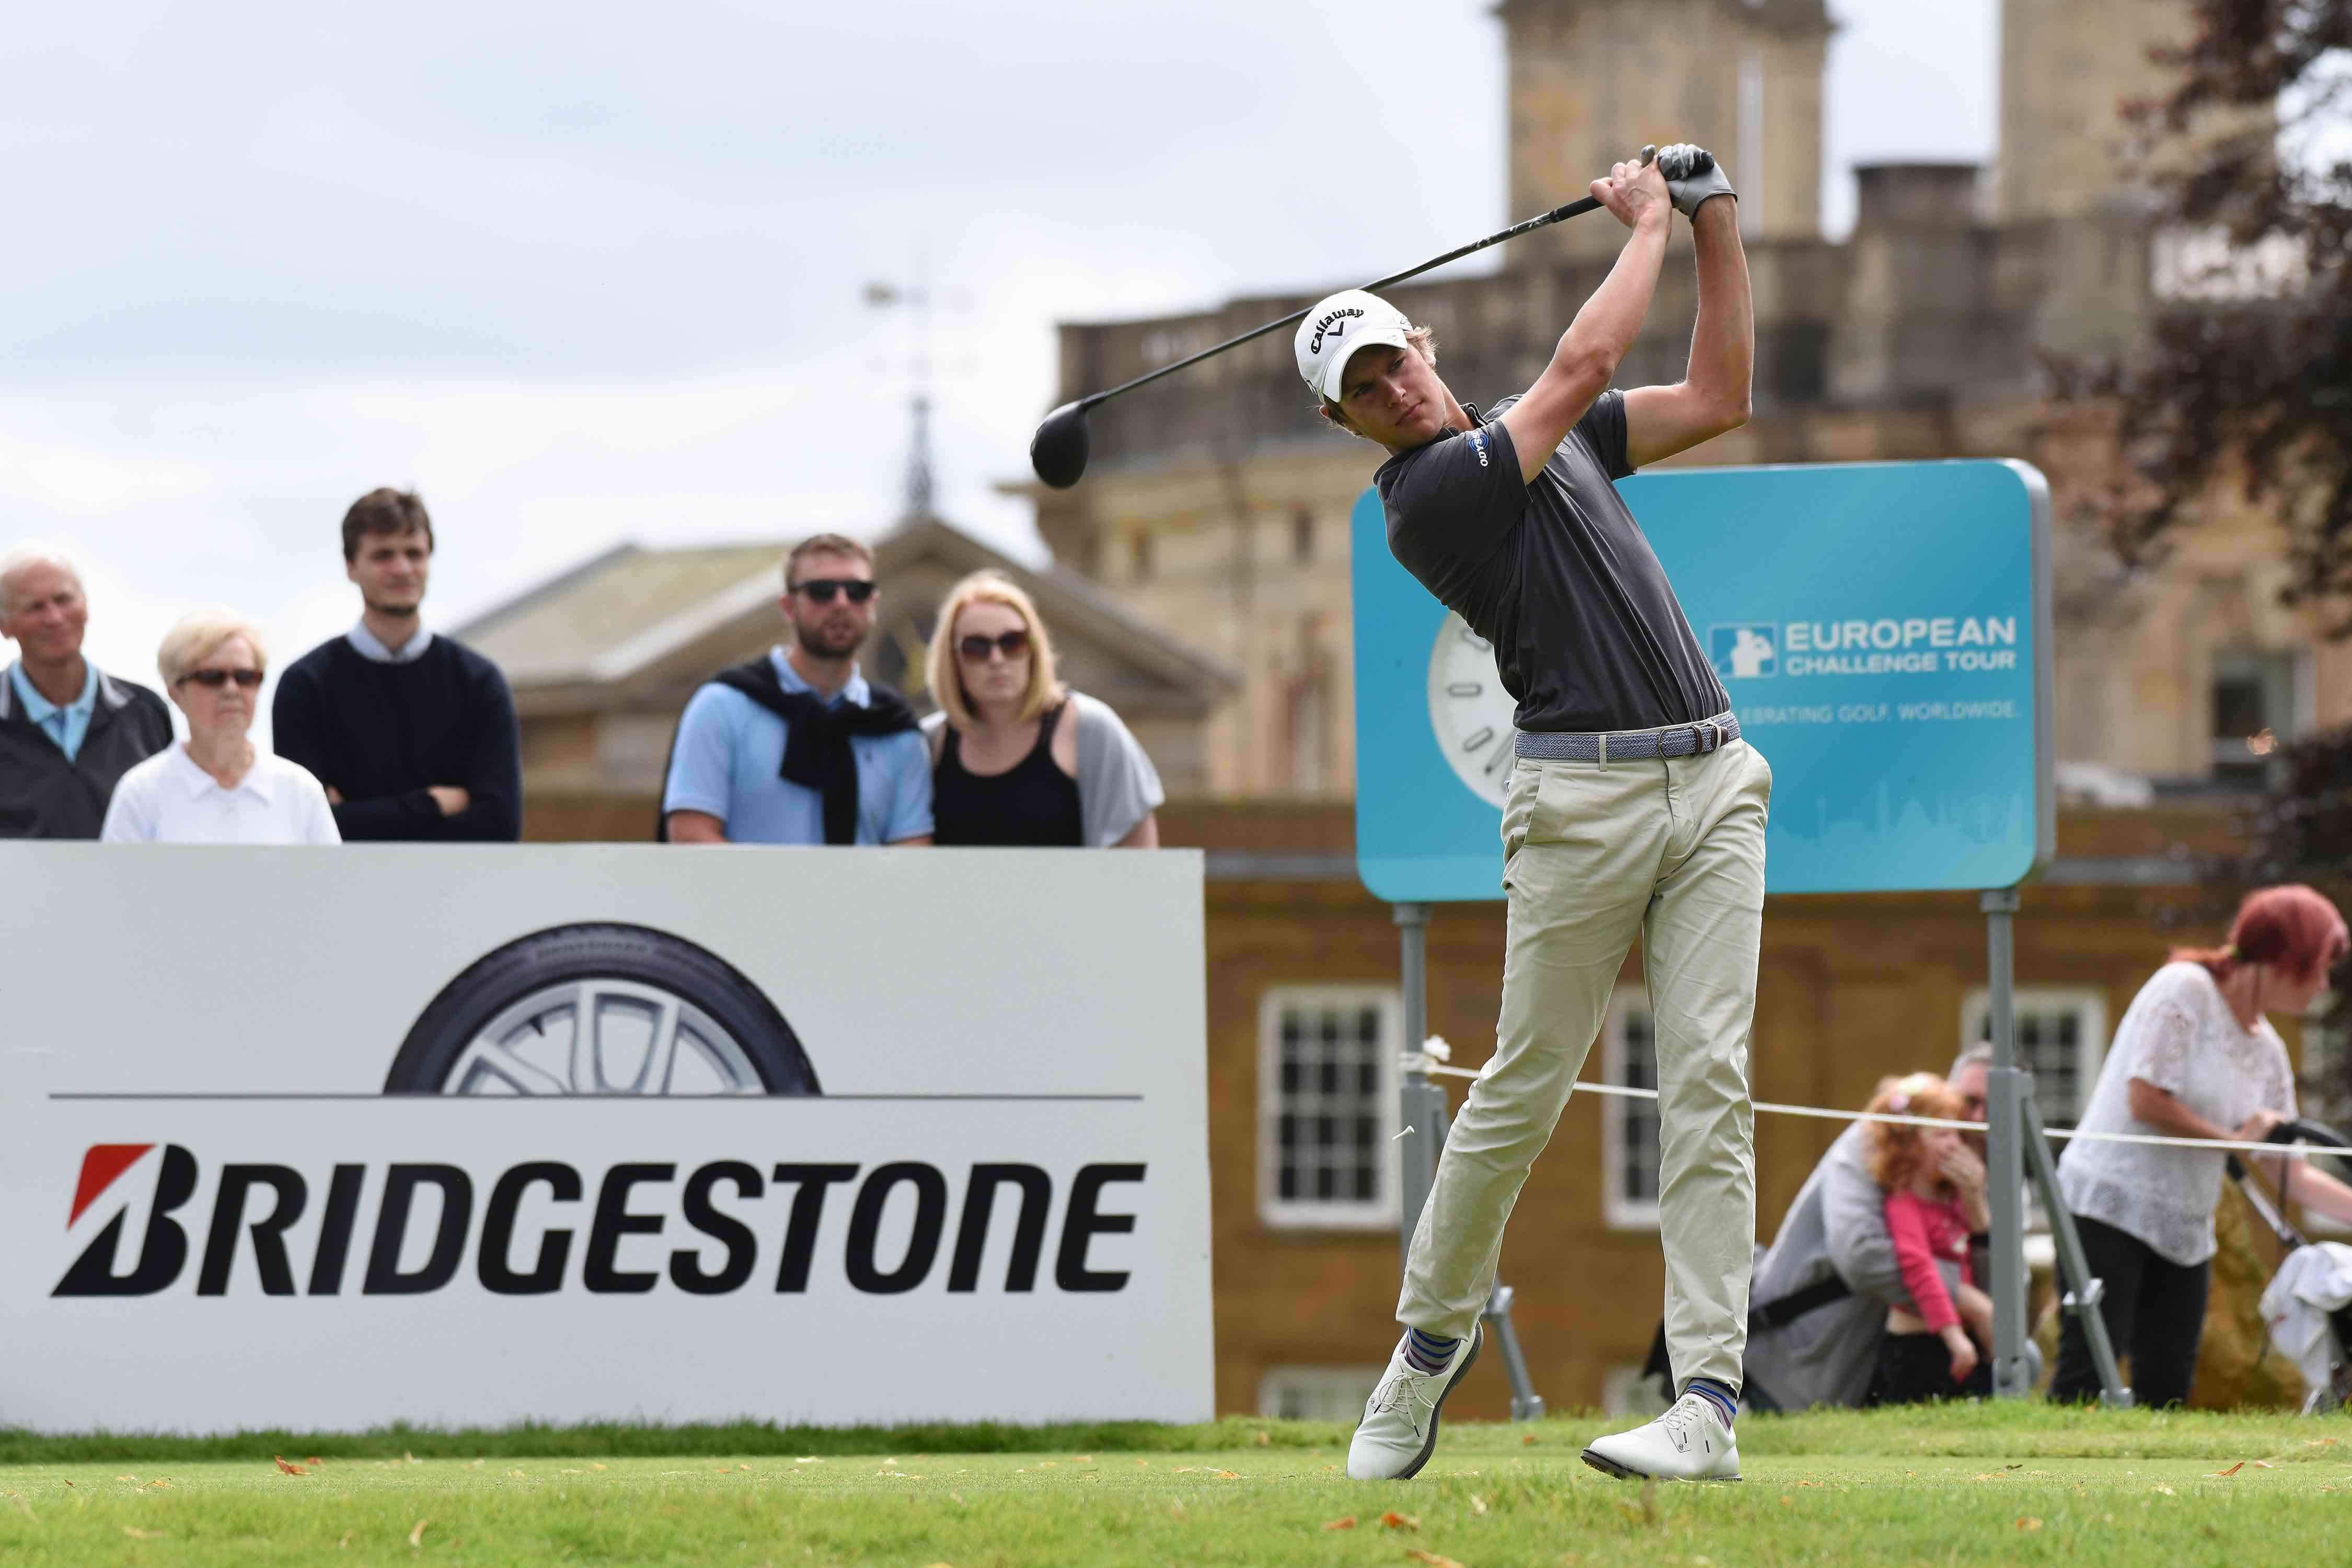 Bridgestone in full swing after memorable Challenge success